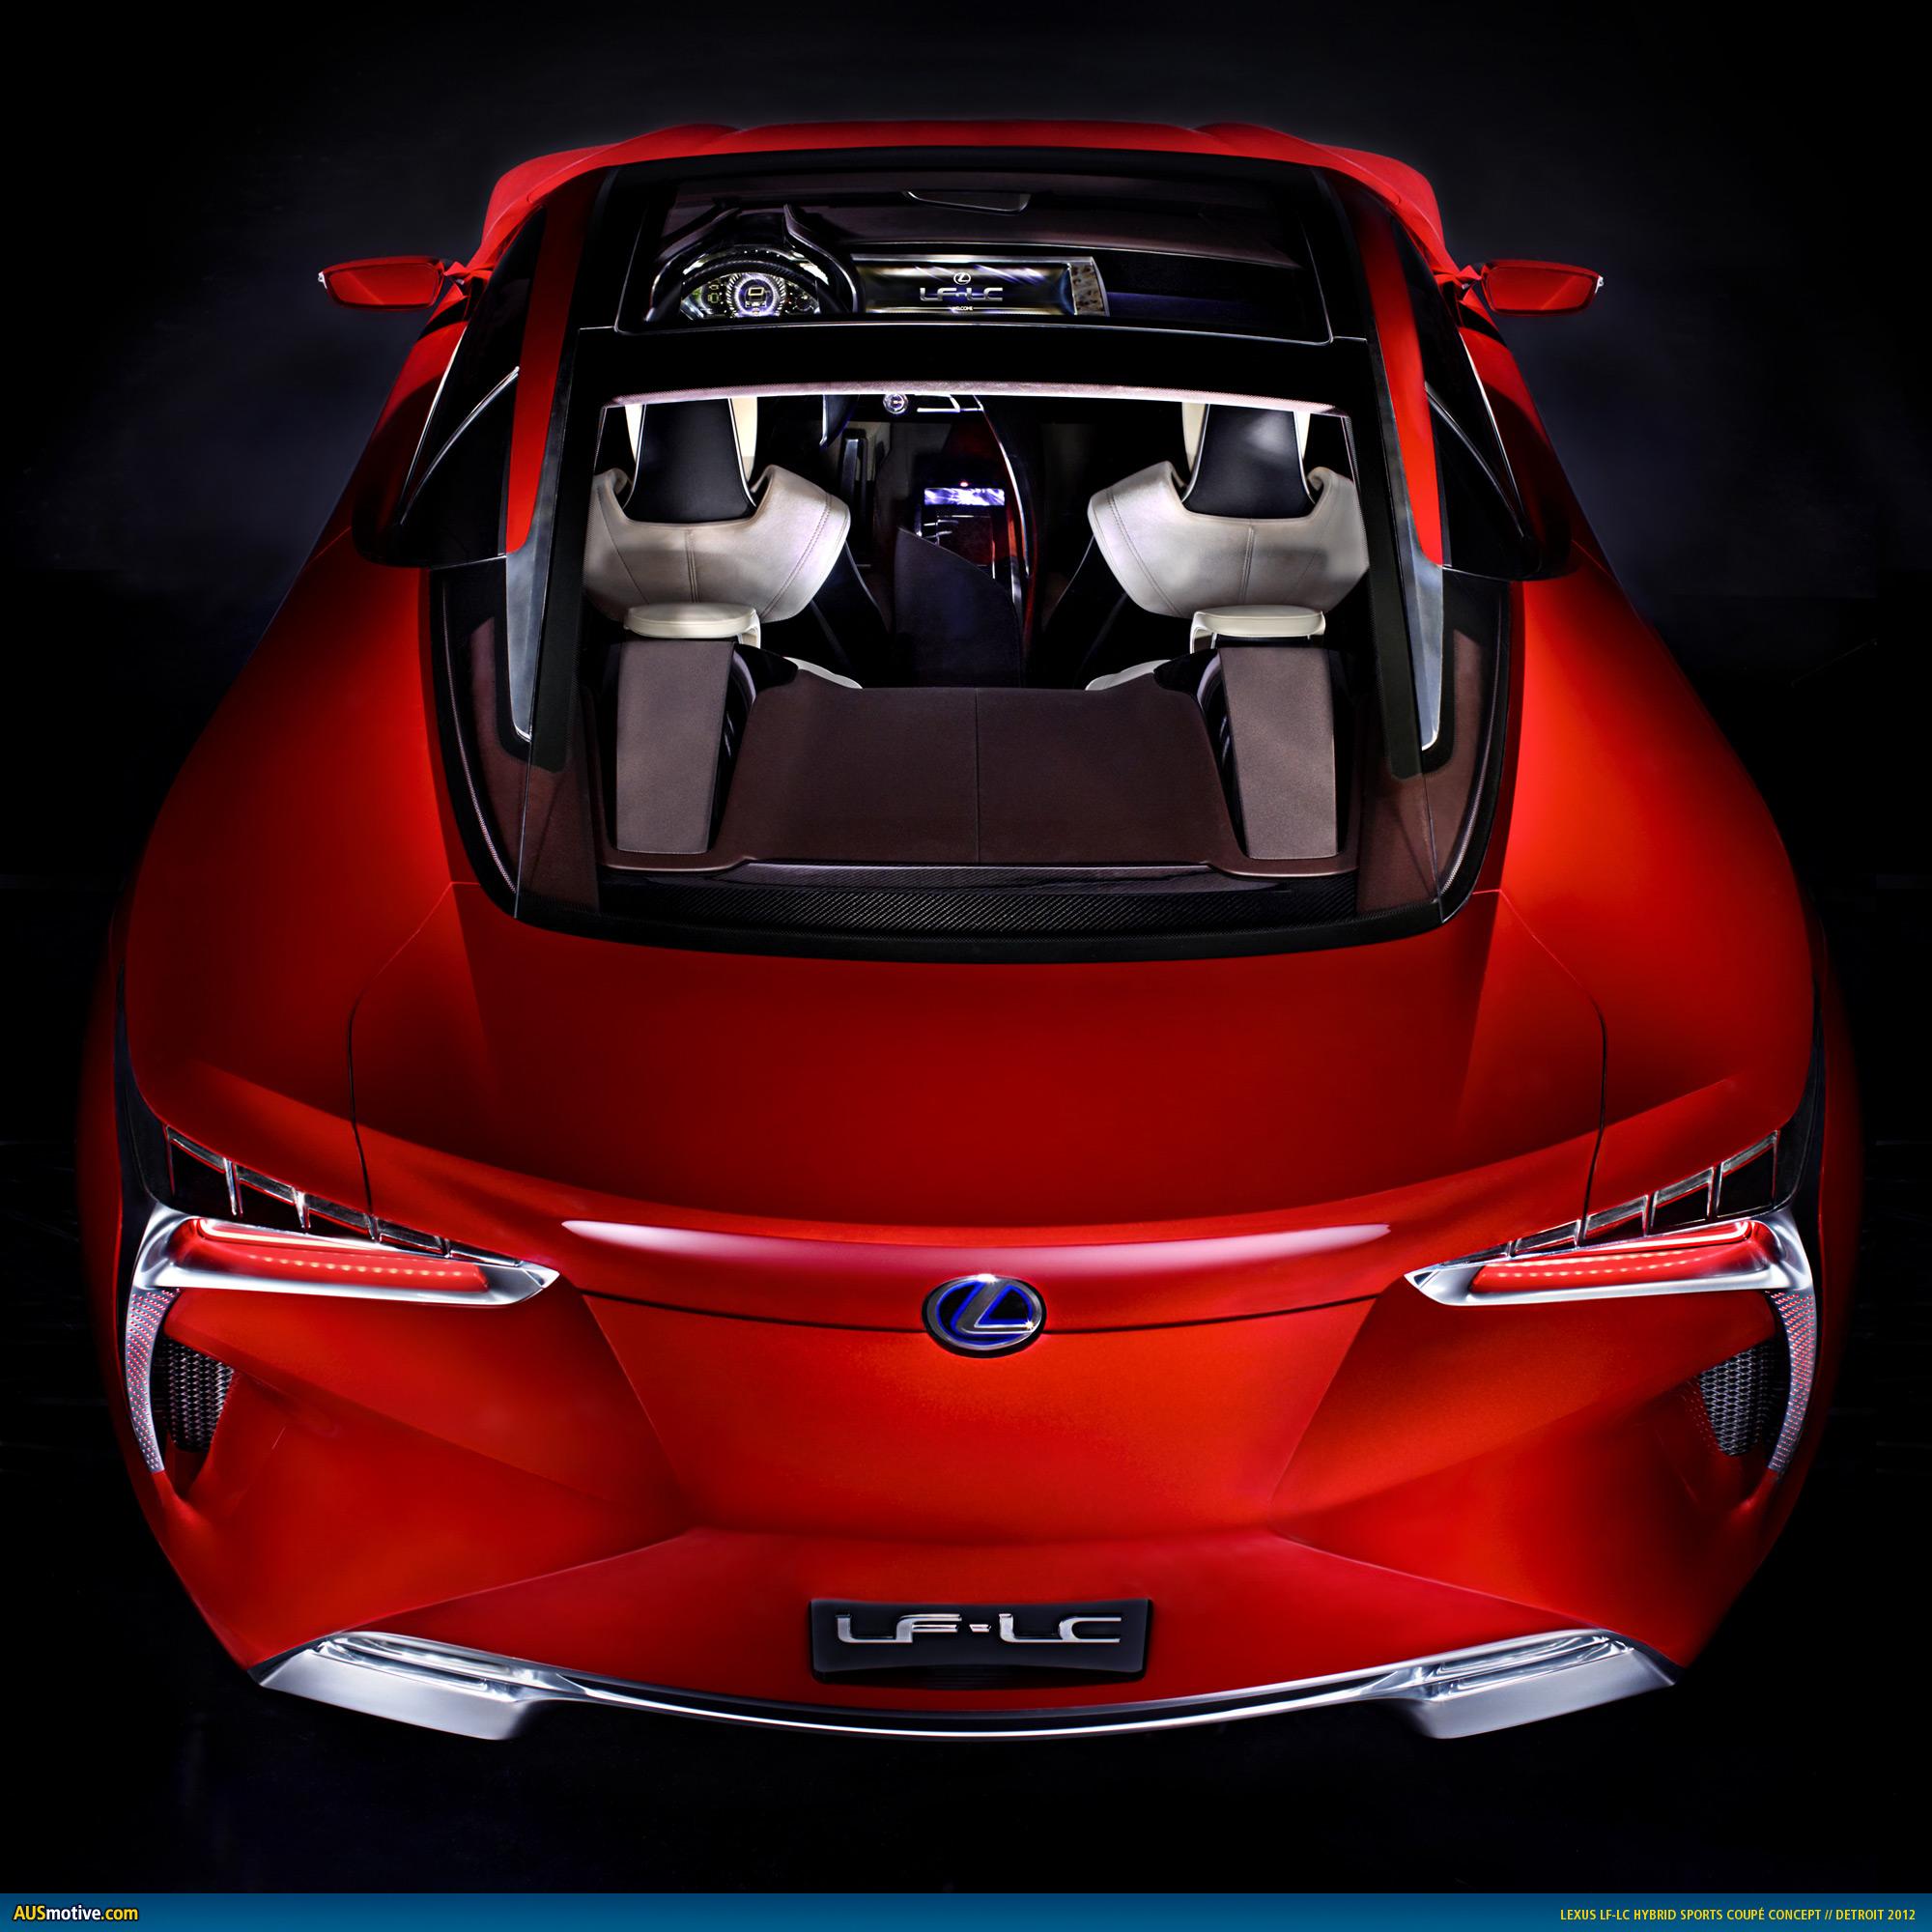 http://www.ausmotive.com/pics/2012/Lexus-LF-LC-03.jpg